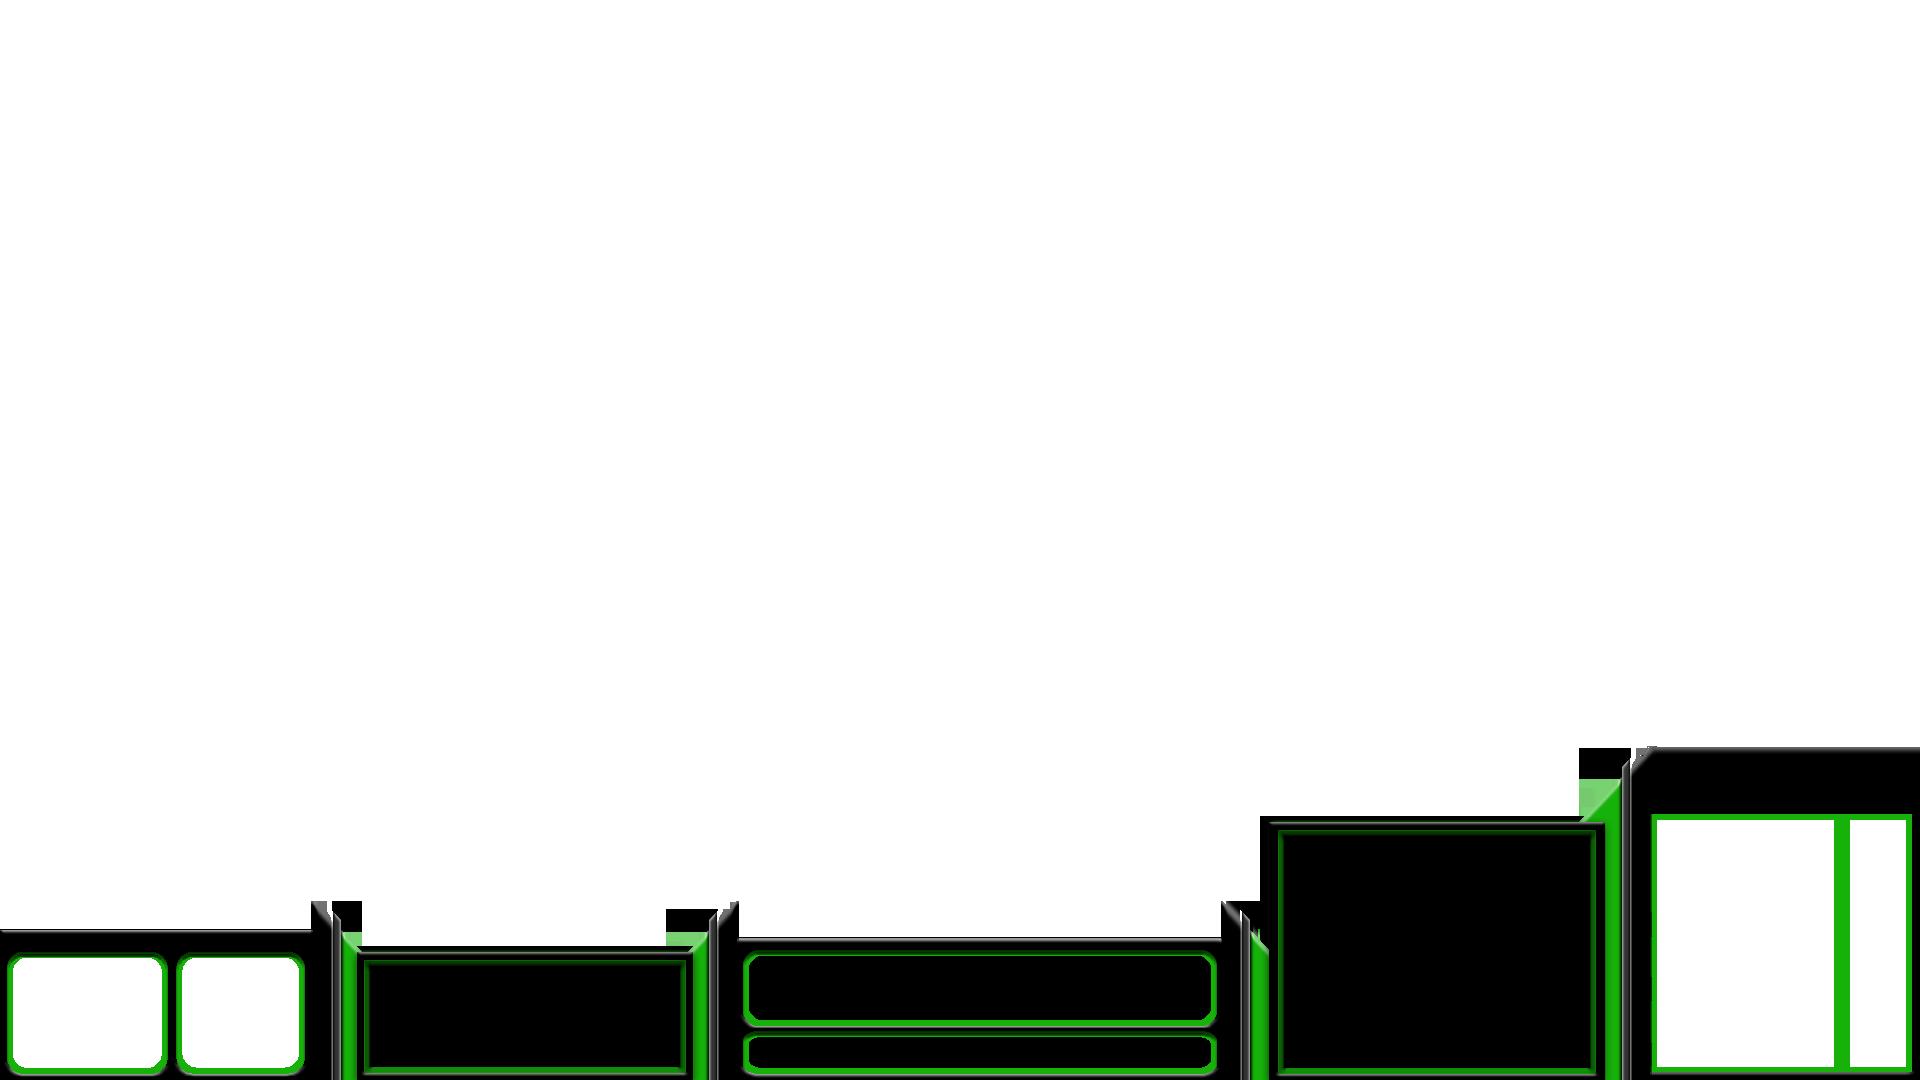 csgo overlay green 1920x1080 - photo #26